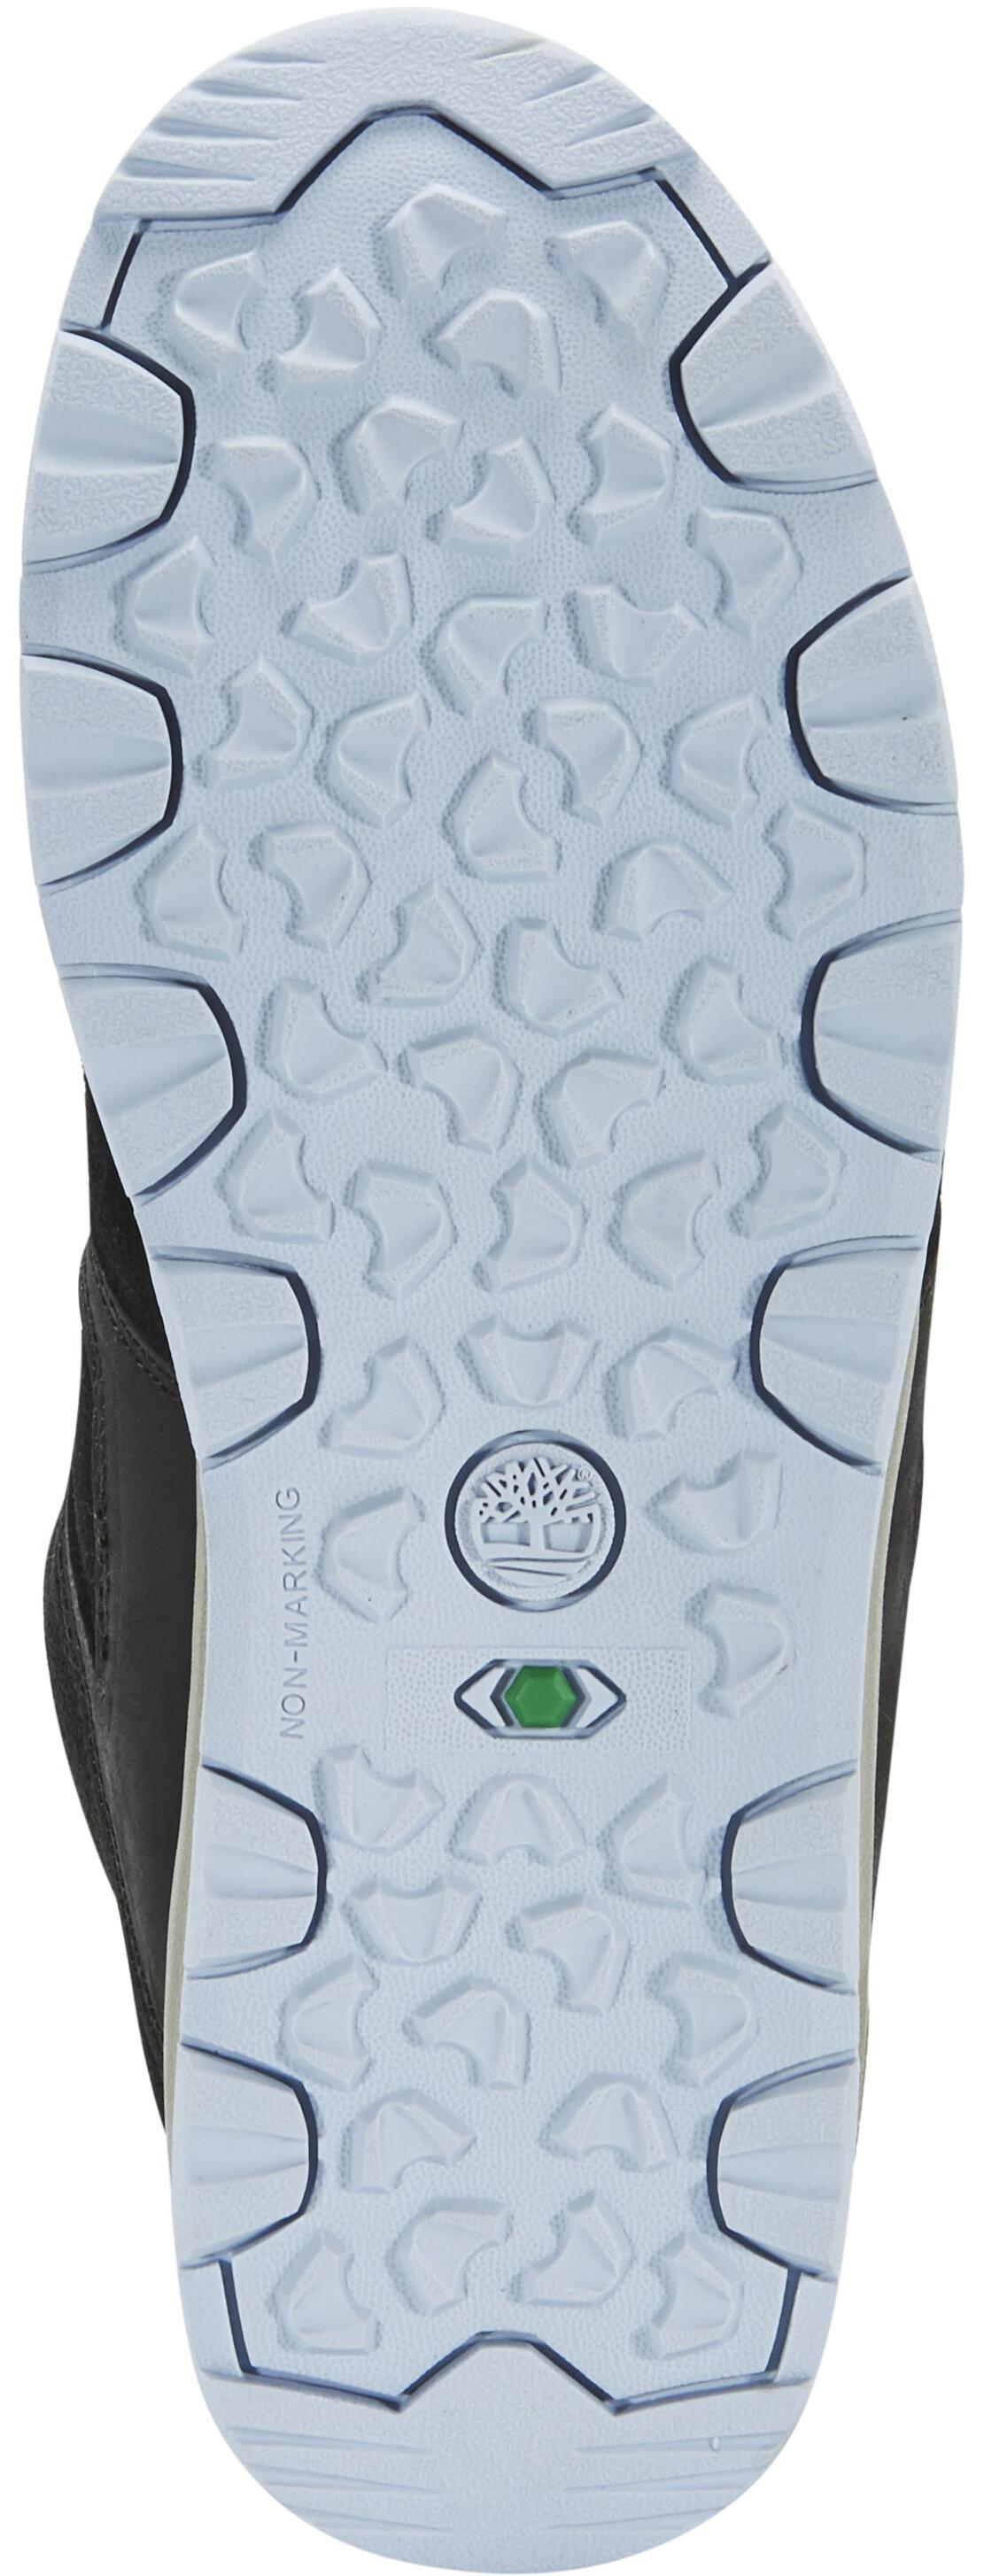 Timberland GT Scramble Lapset kengät WP Leather  b5e71a7ac3